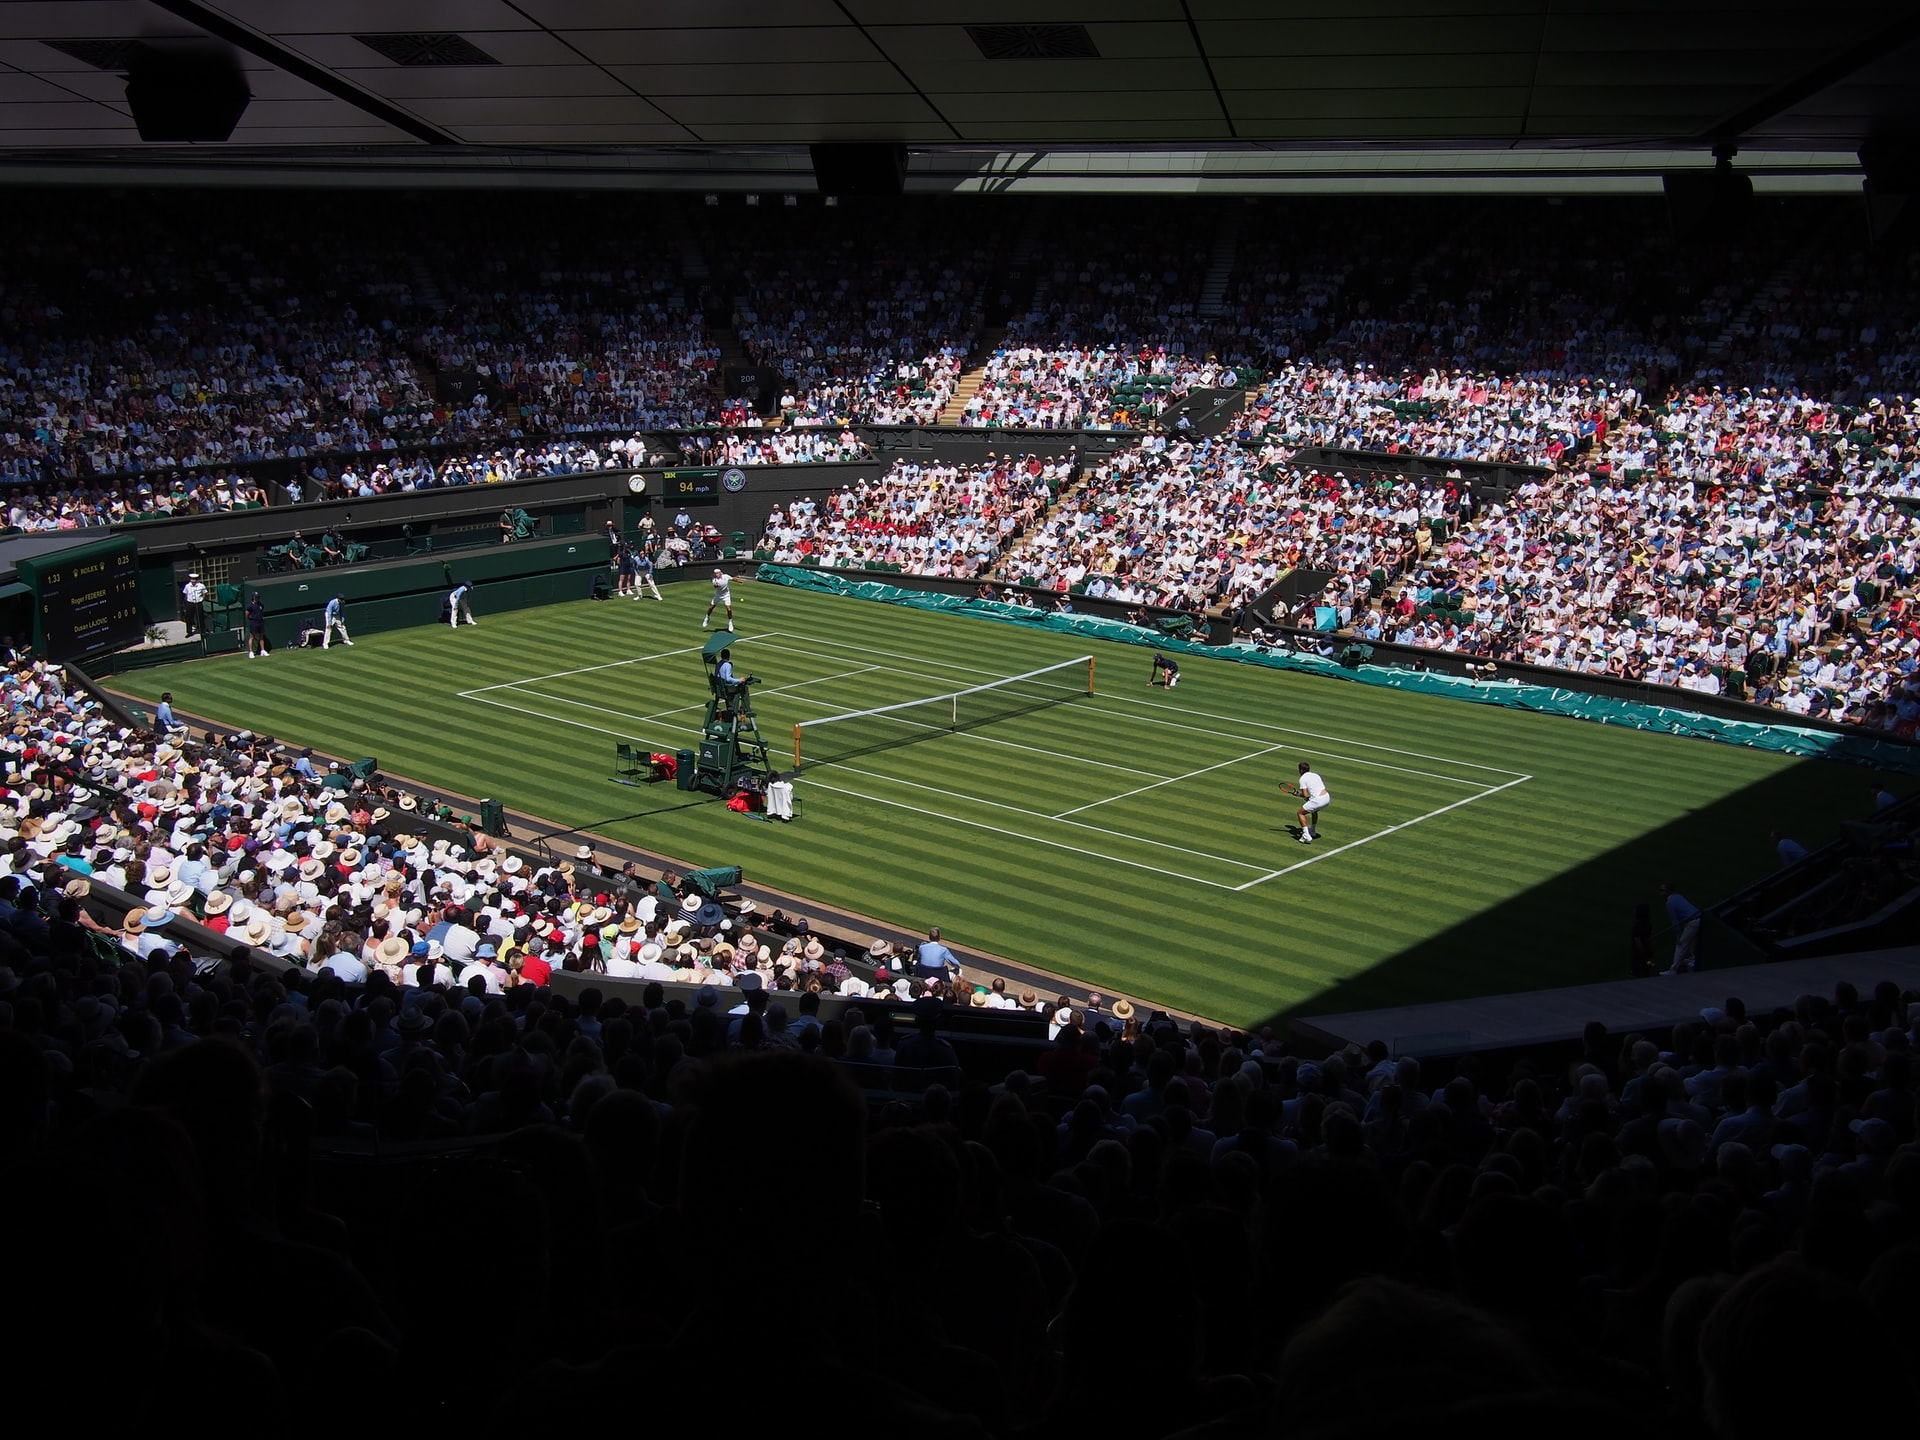 Typy na tenis (Wimbledon)